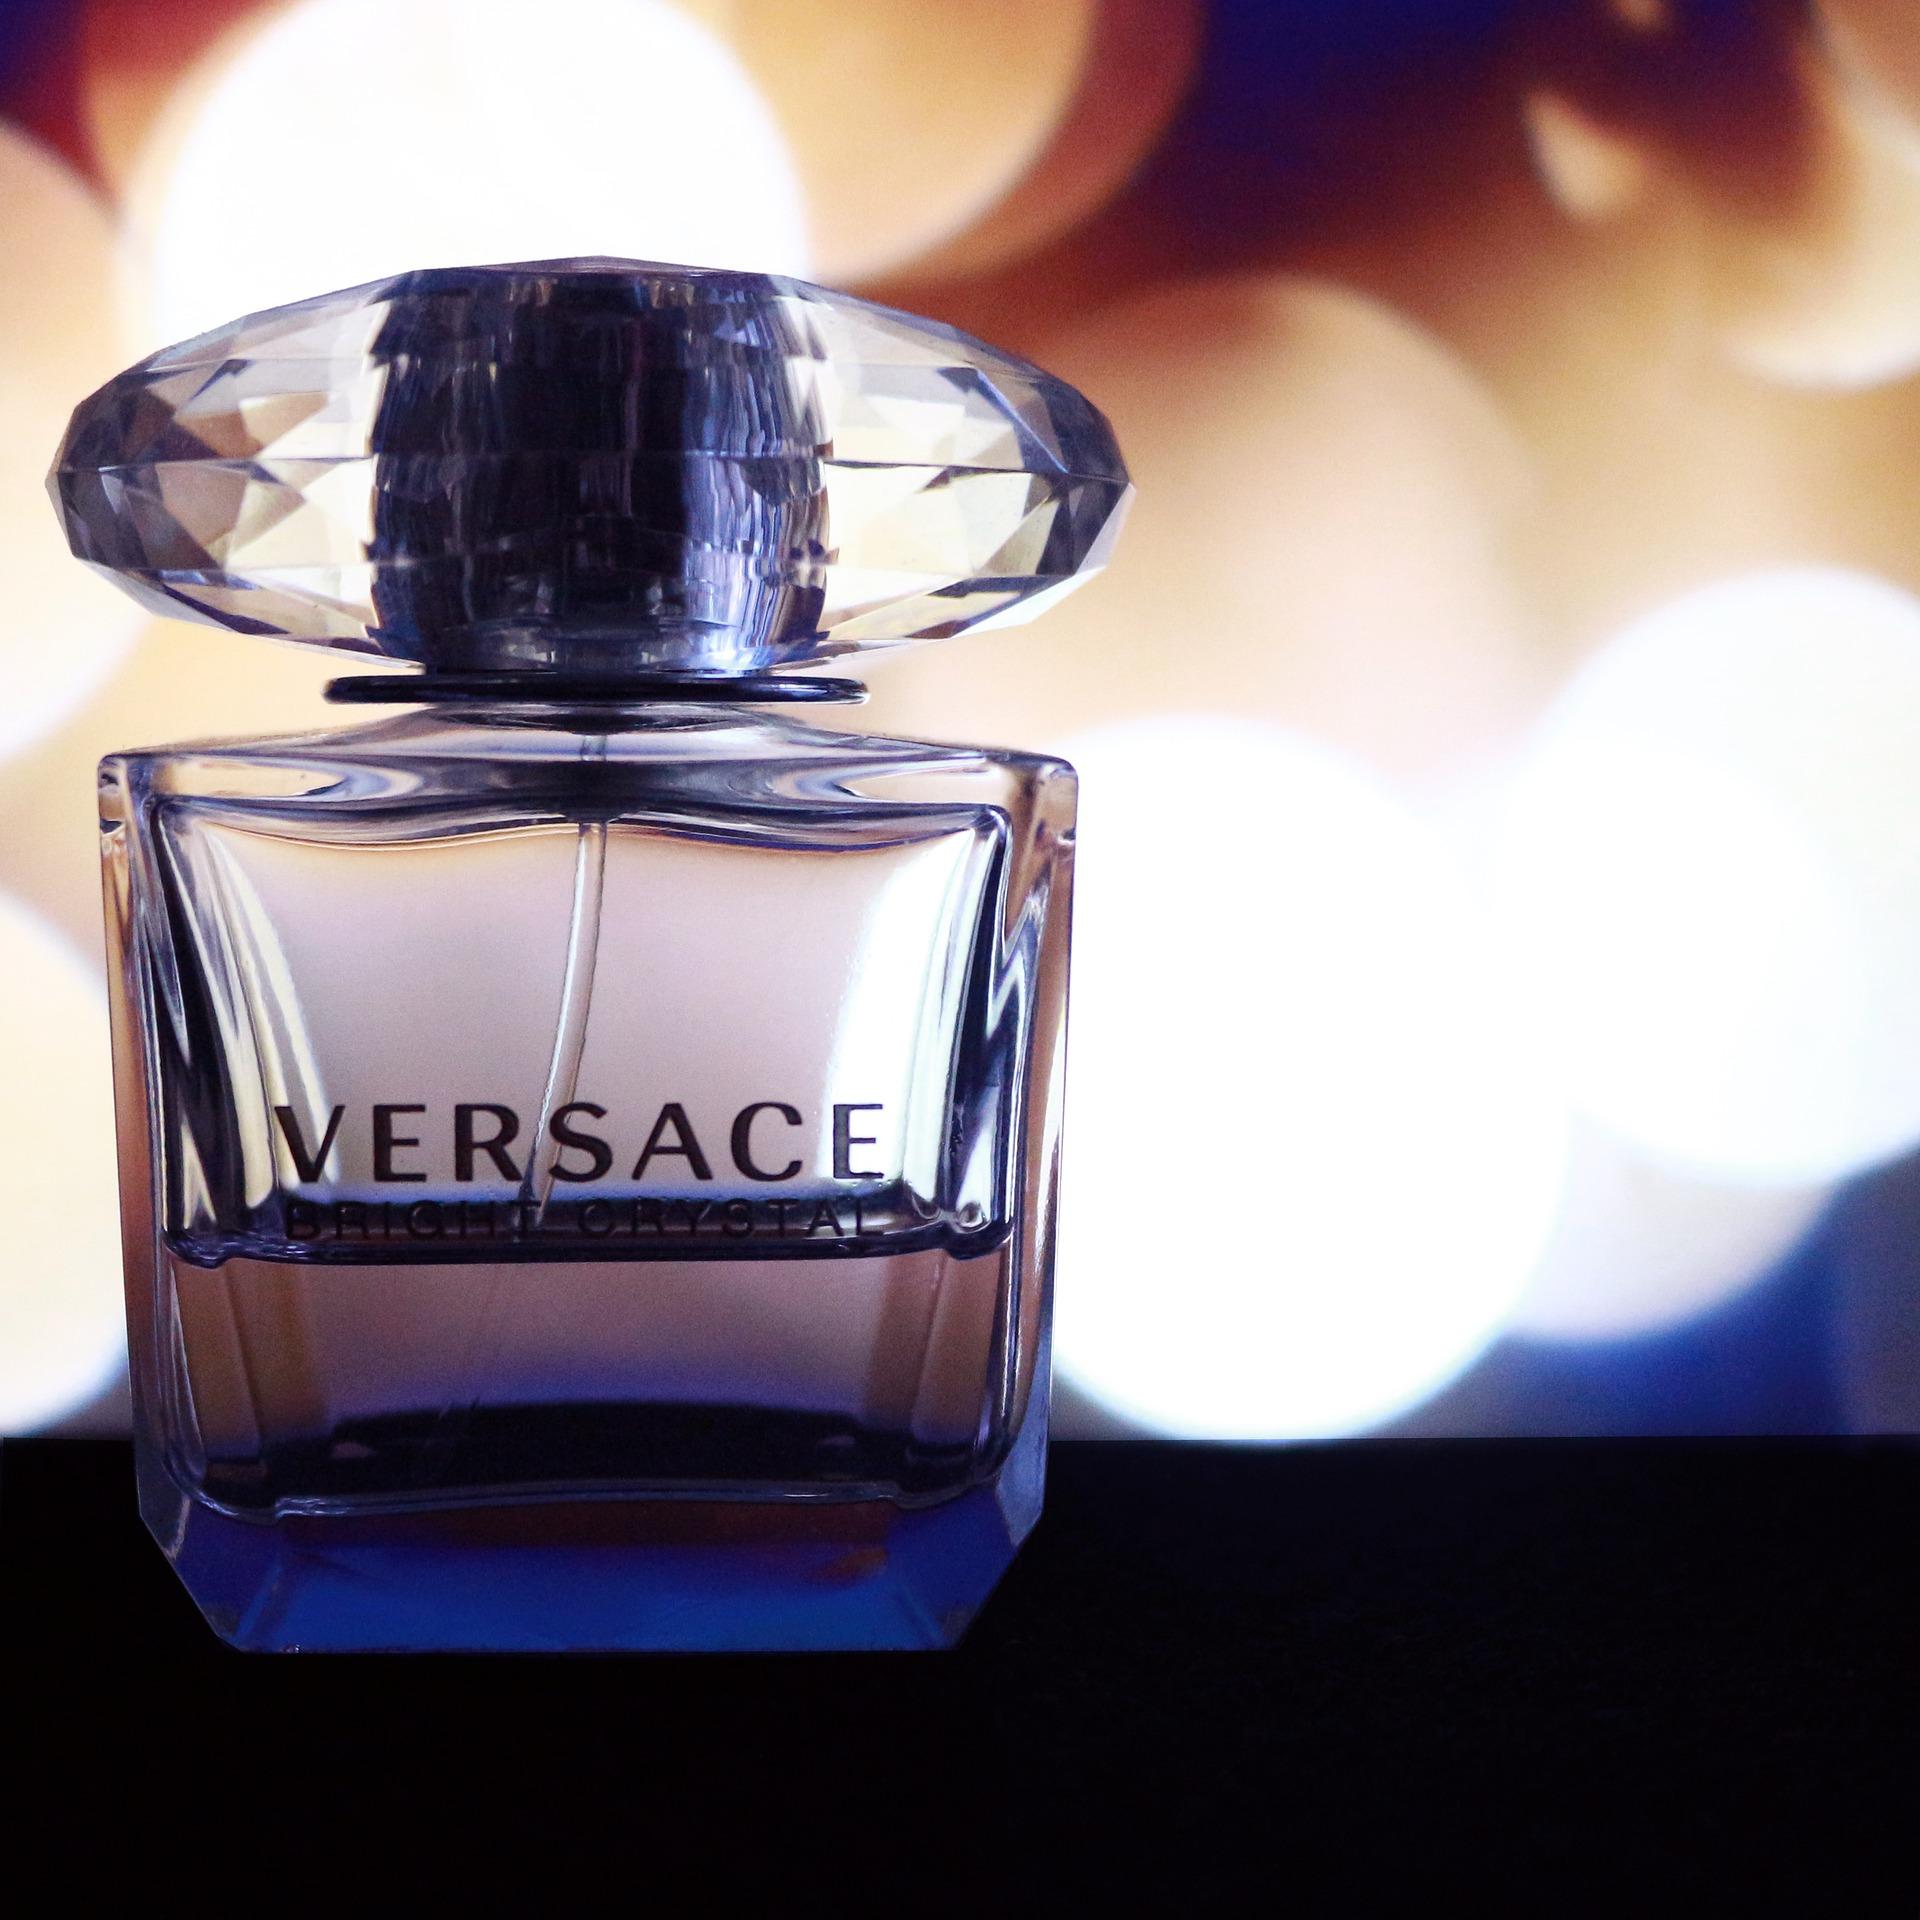 Váhy A Versace